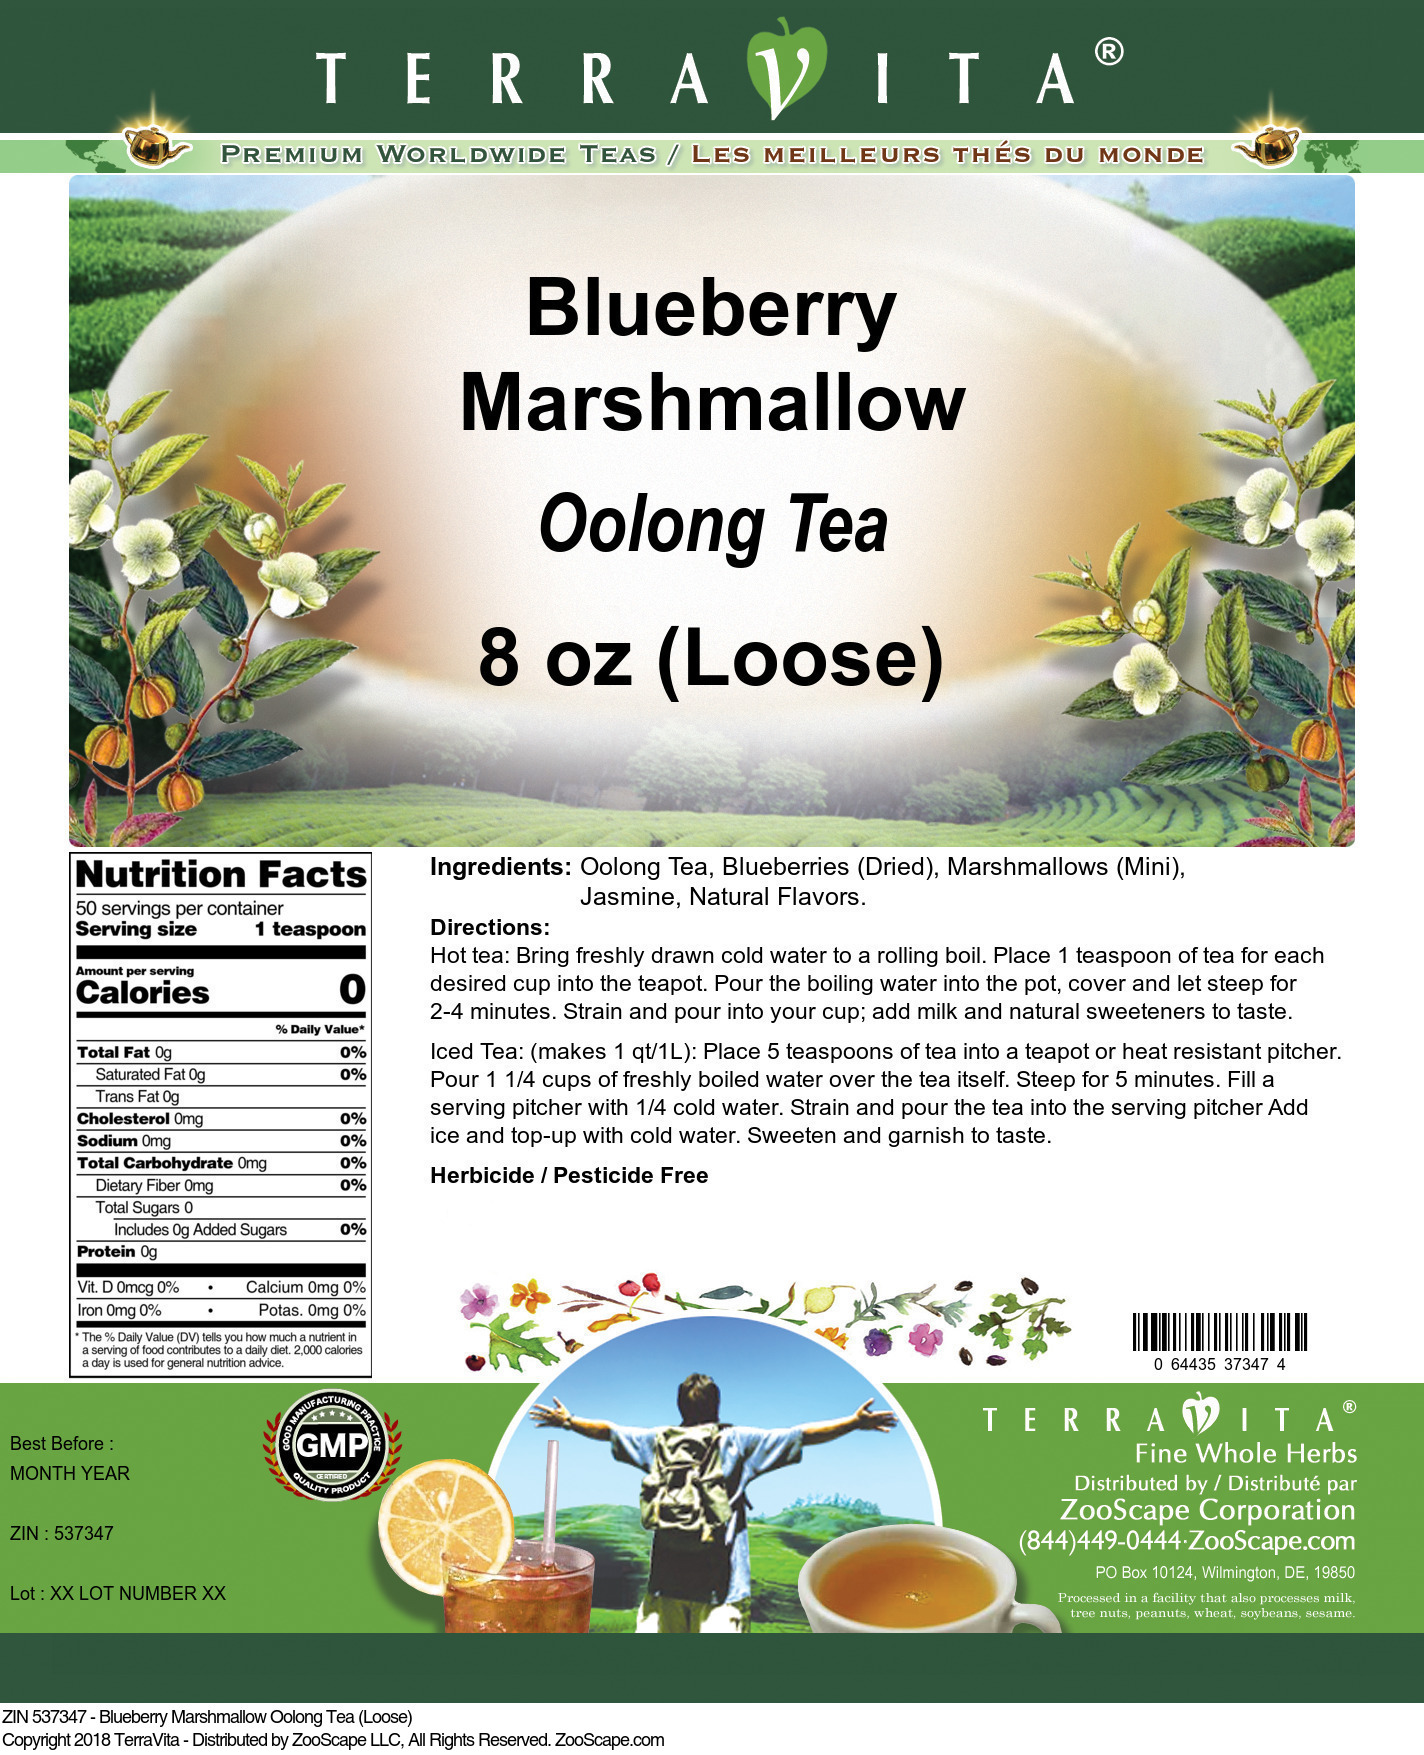 Blueberry Marshmallow Oolong Tea